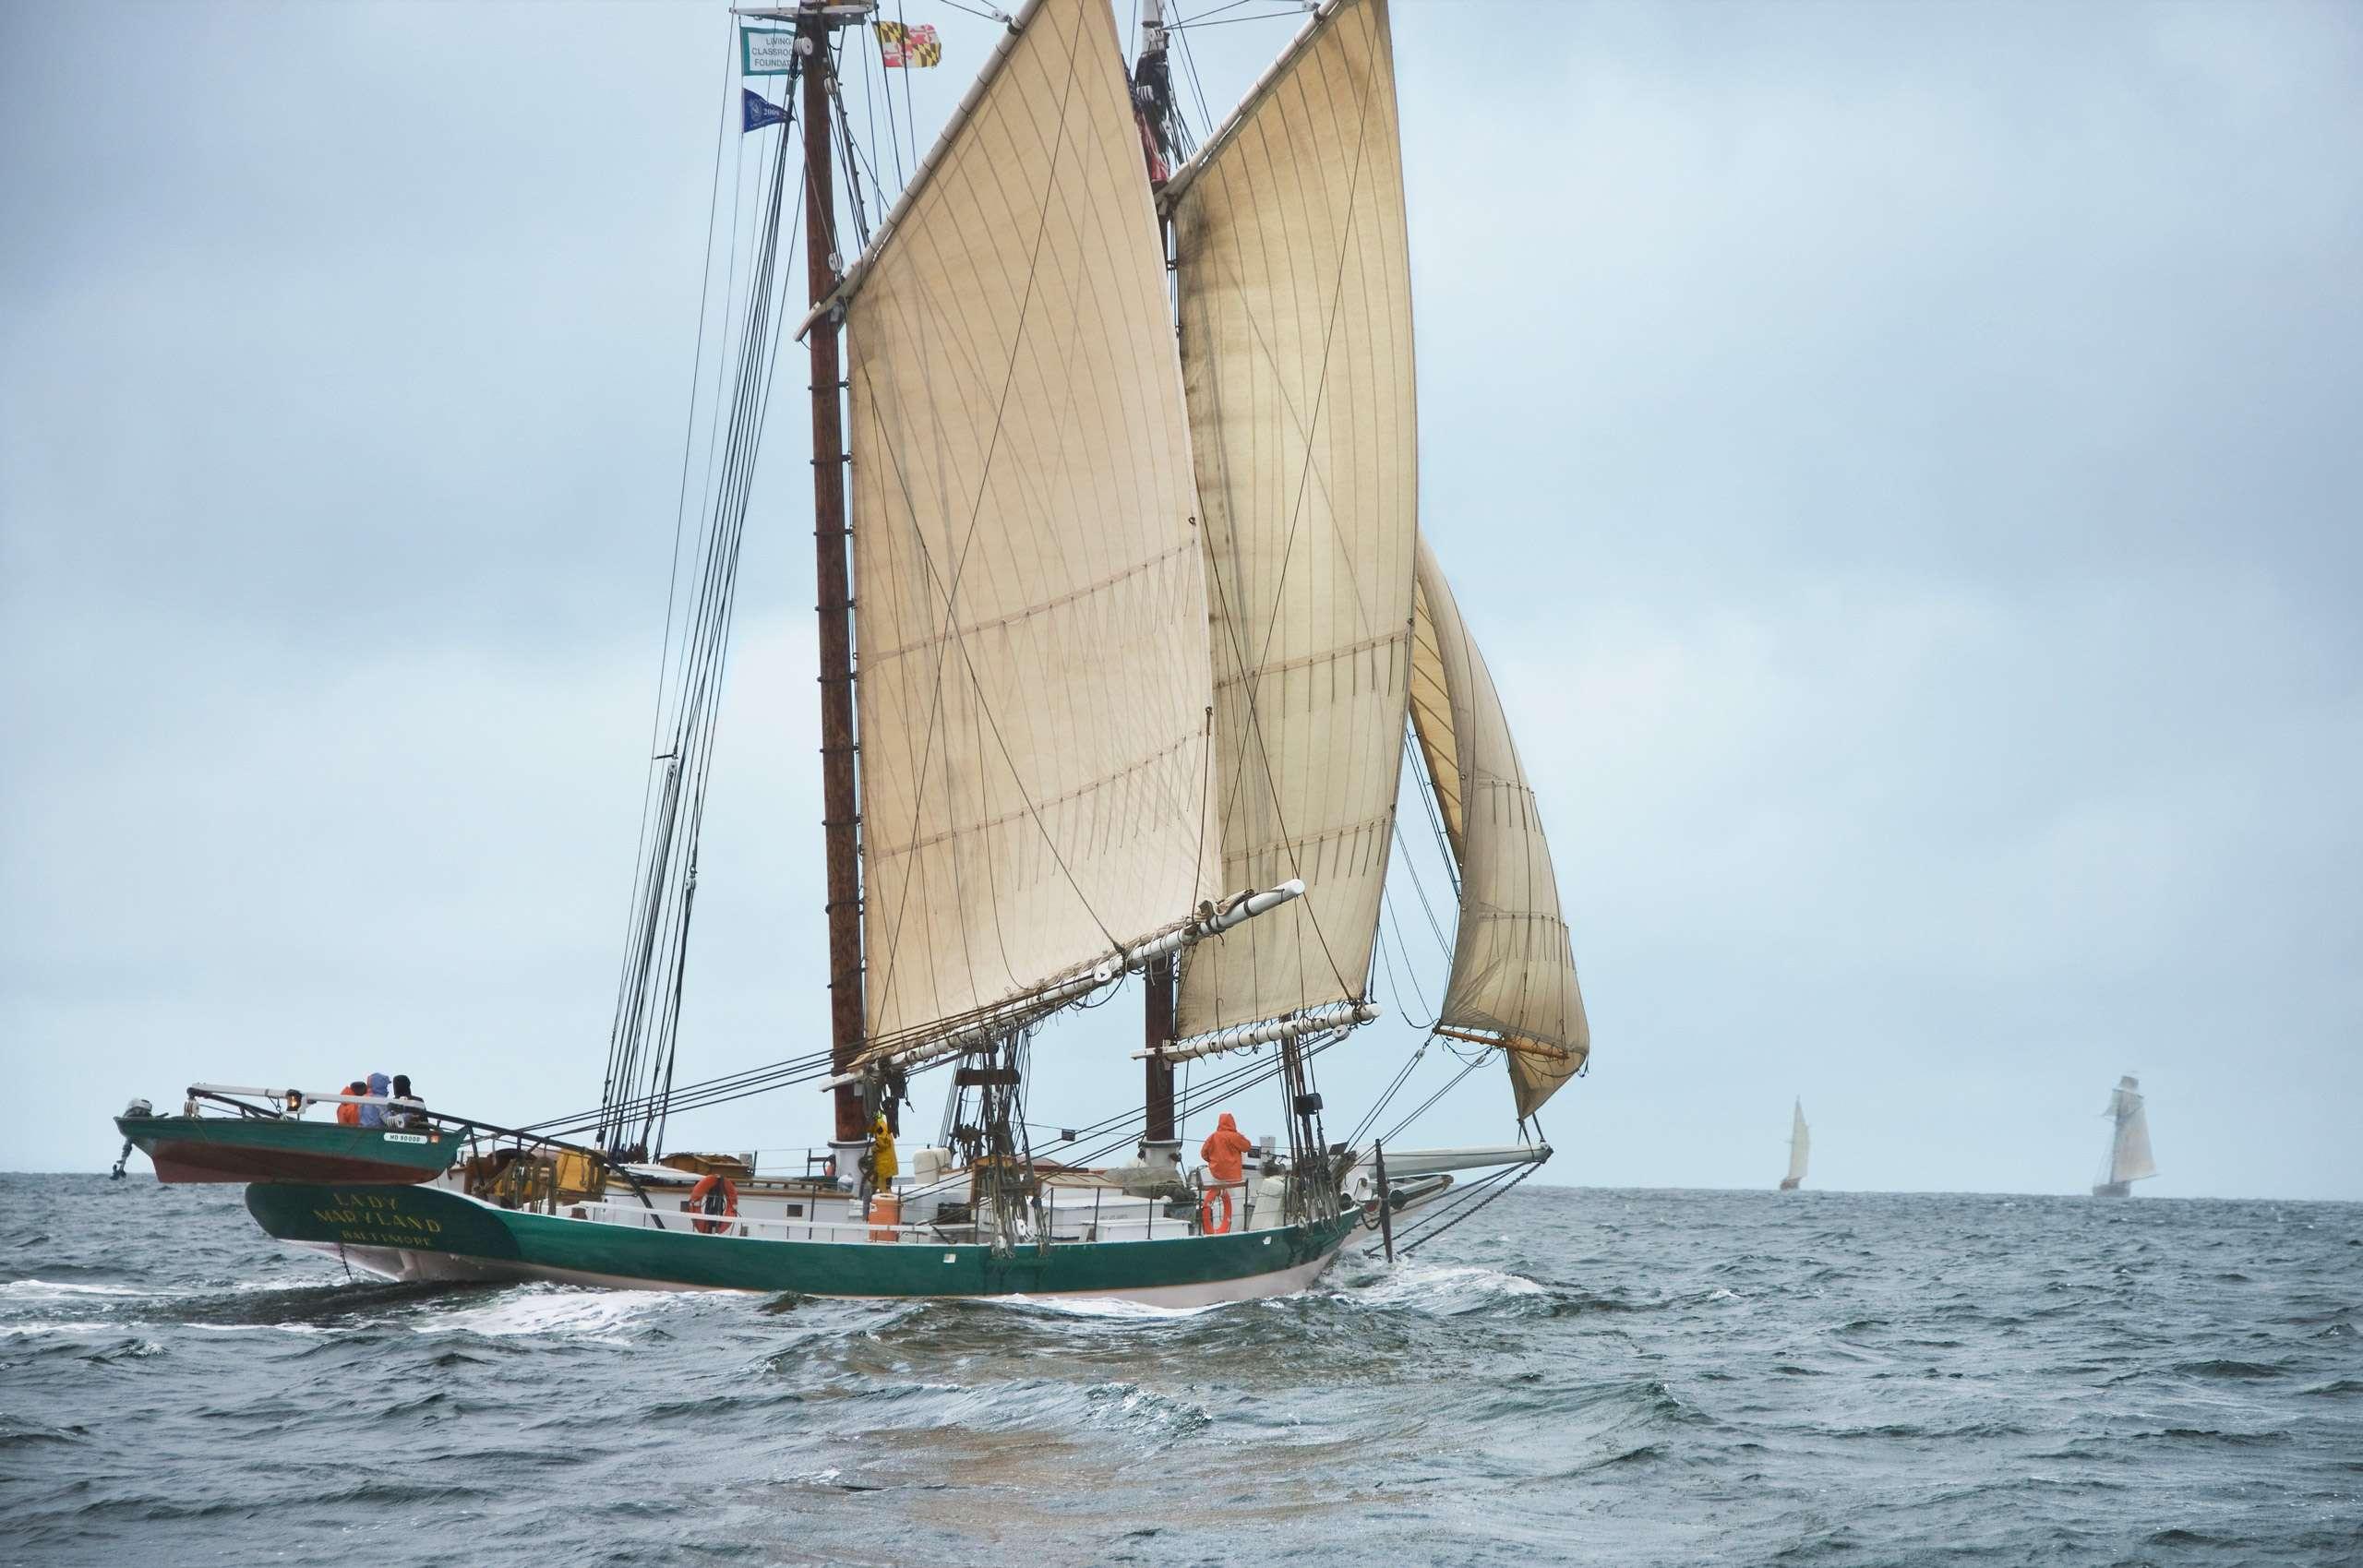 PORTFOLIO - Sailing - Tall Ships #5 - PCG604